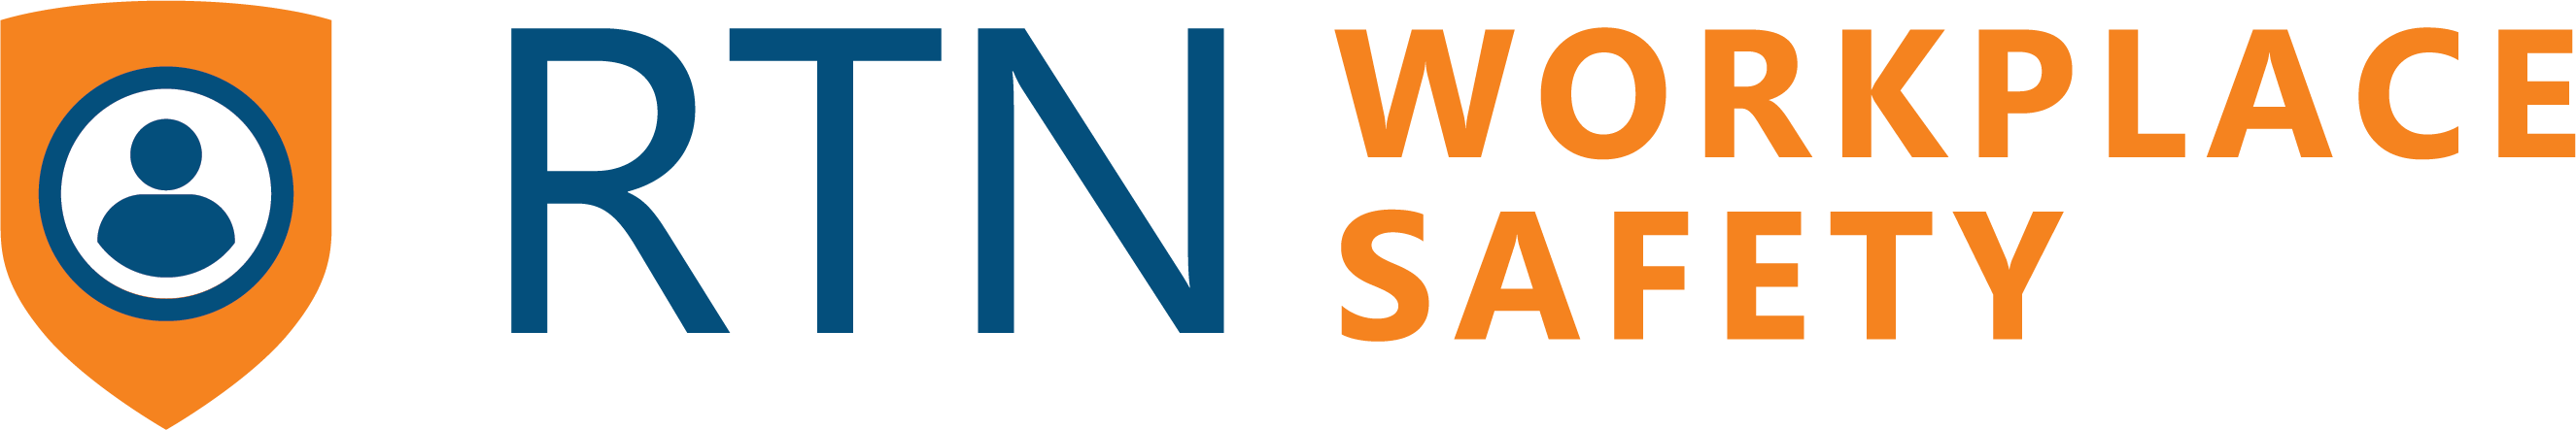 RTN Workplace Safety logo